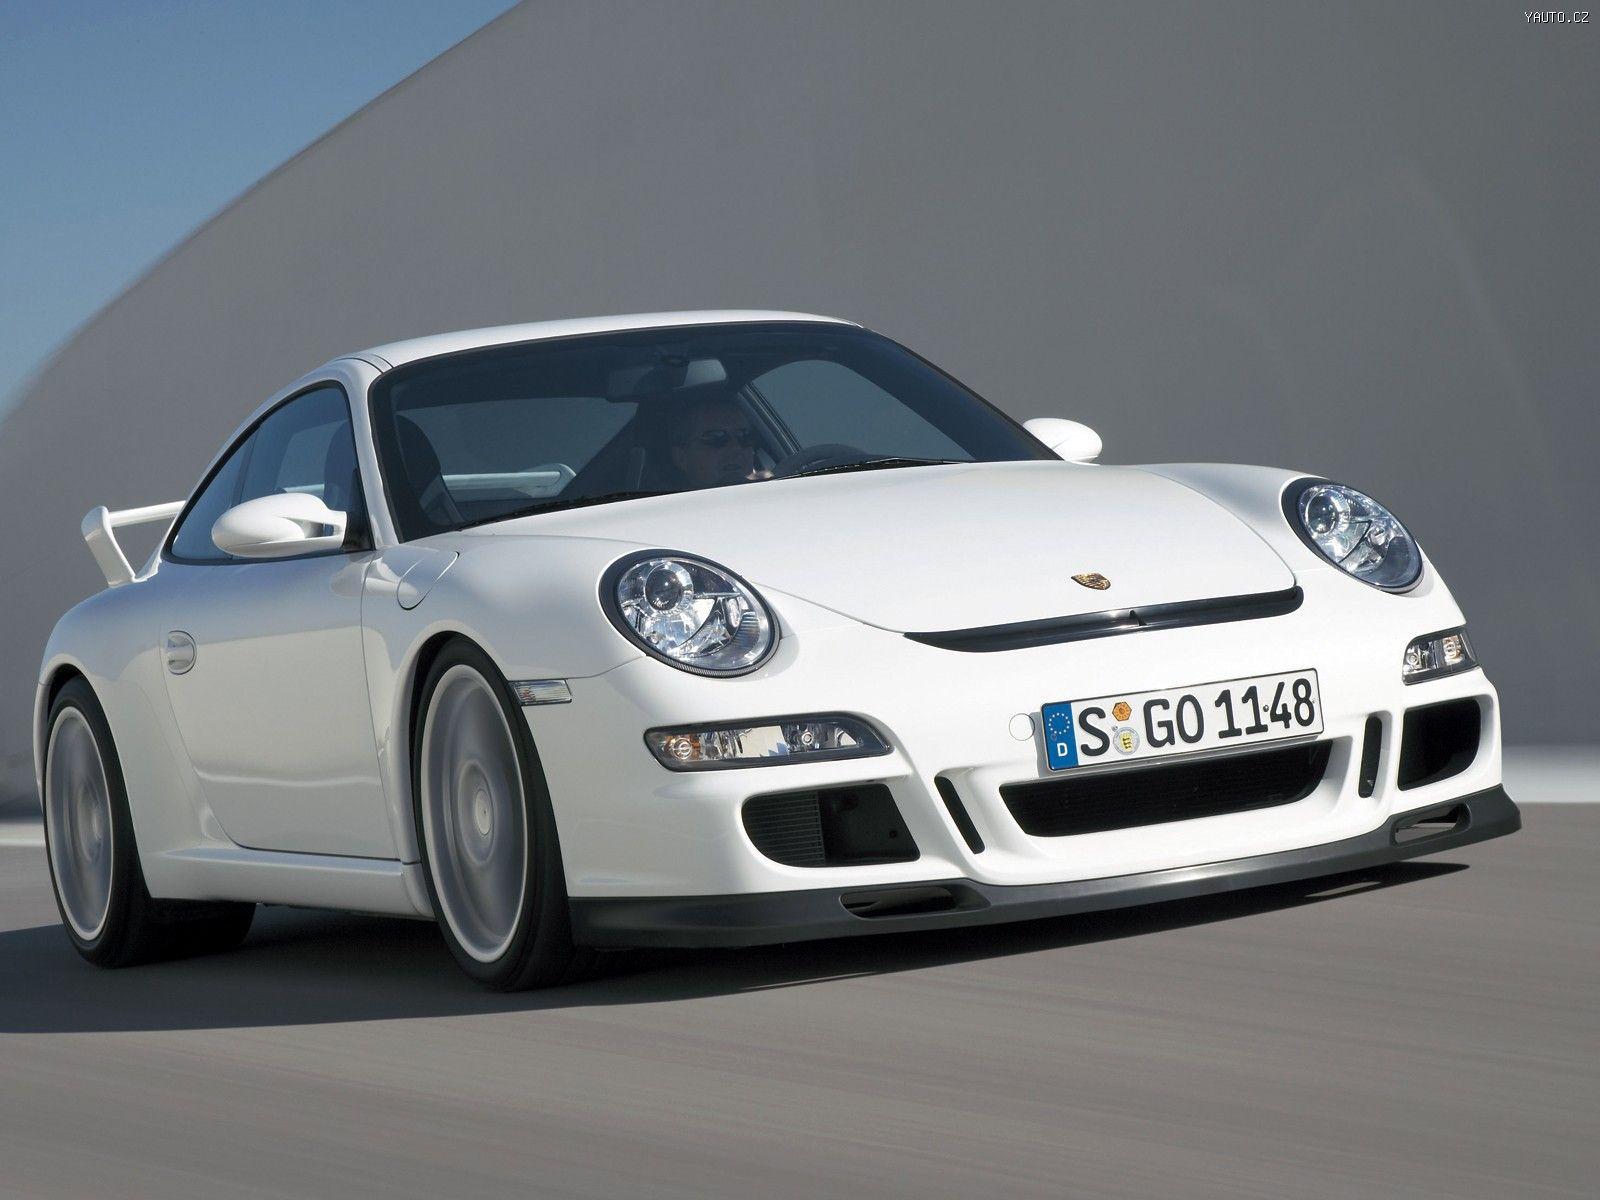 http://img.yauto.cz/tapety/Porsche_911_GT3_2006_3.jpg